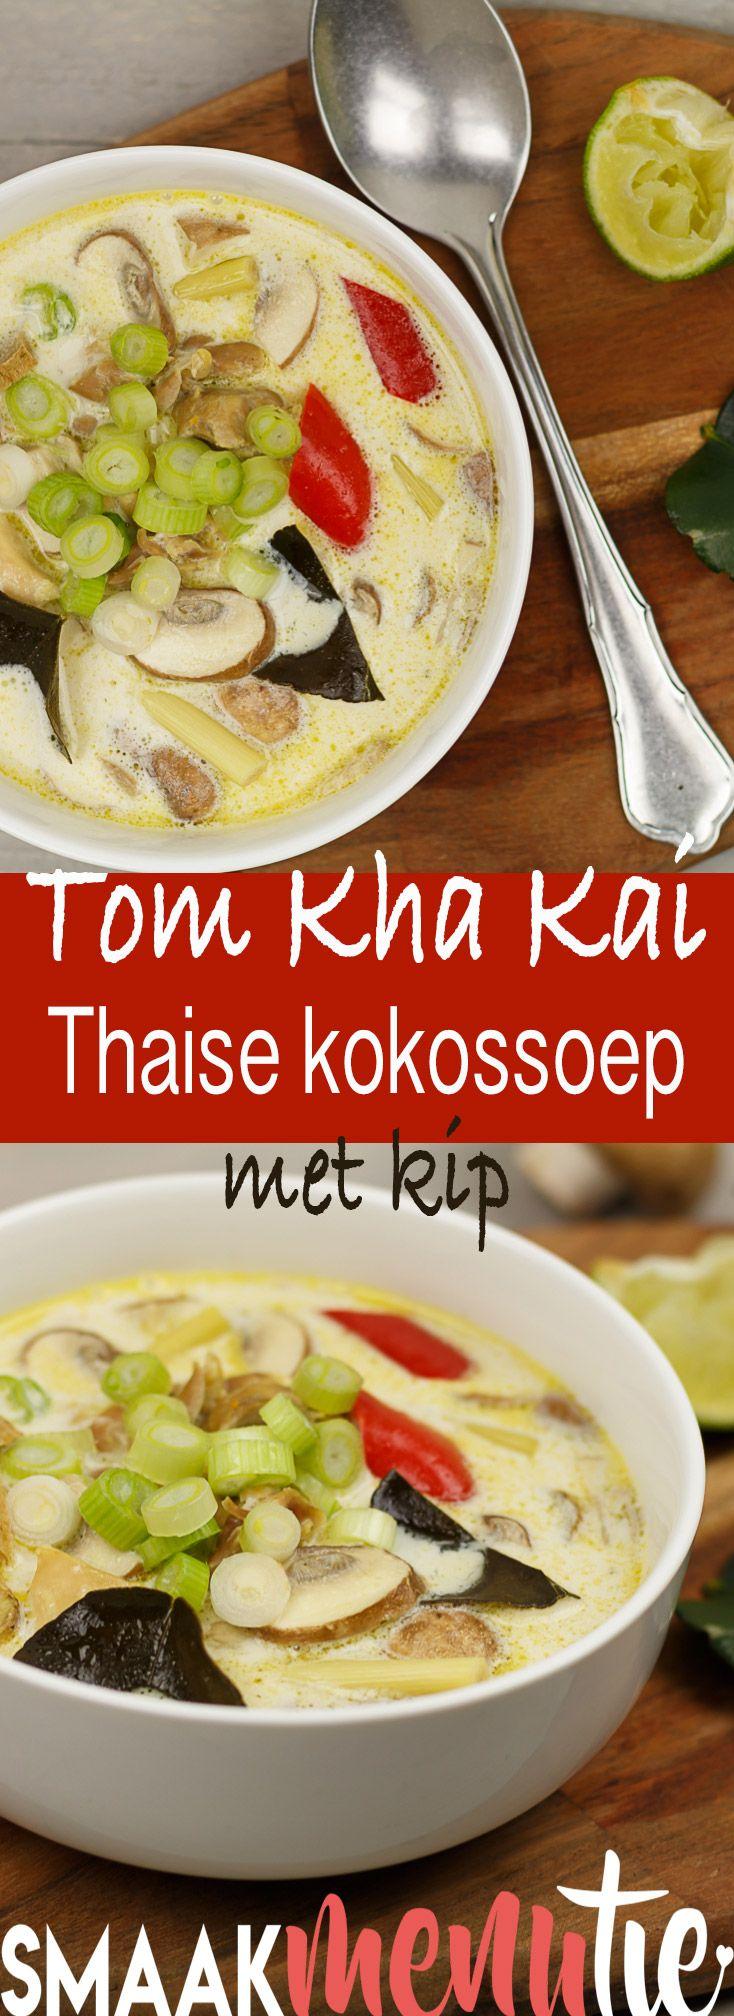 Tom Kha Kai #recept #recipe #soup #thaifood #thailand